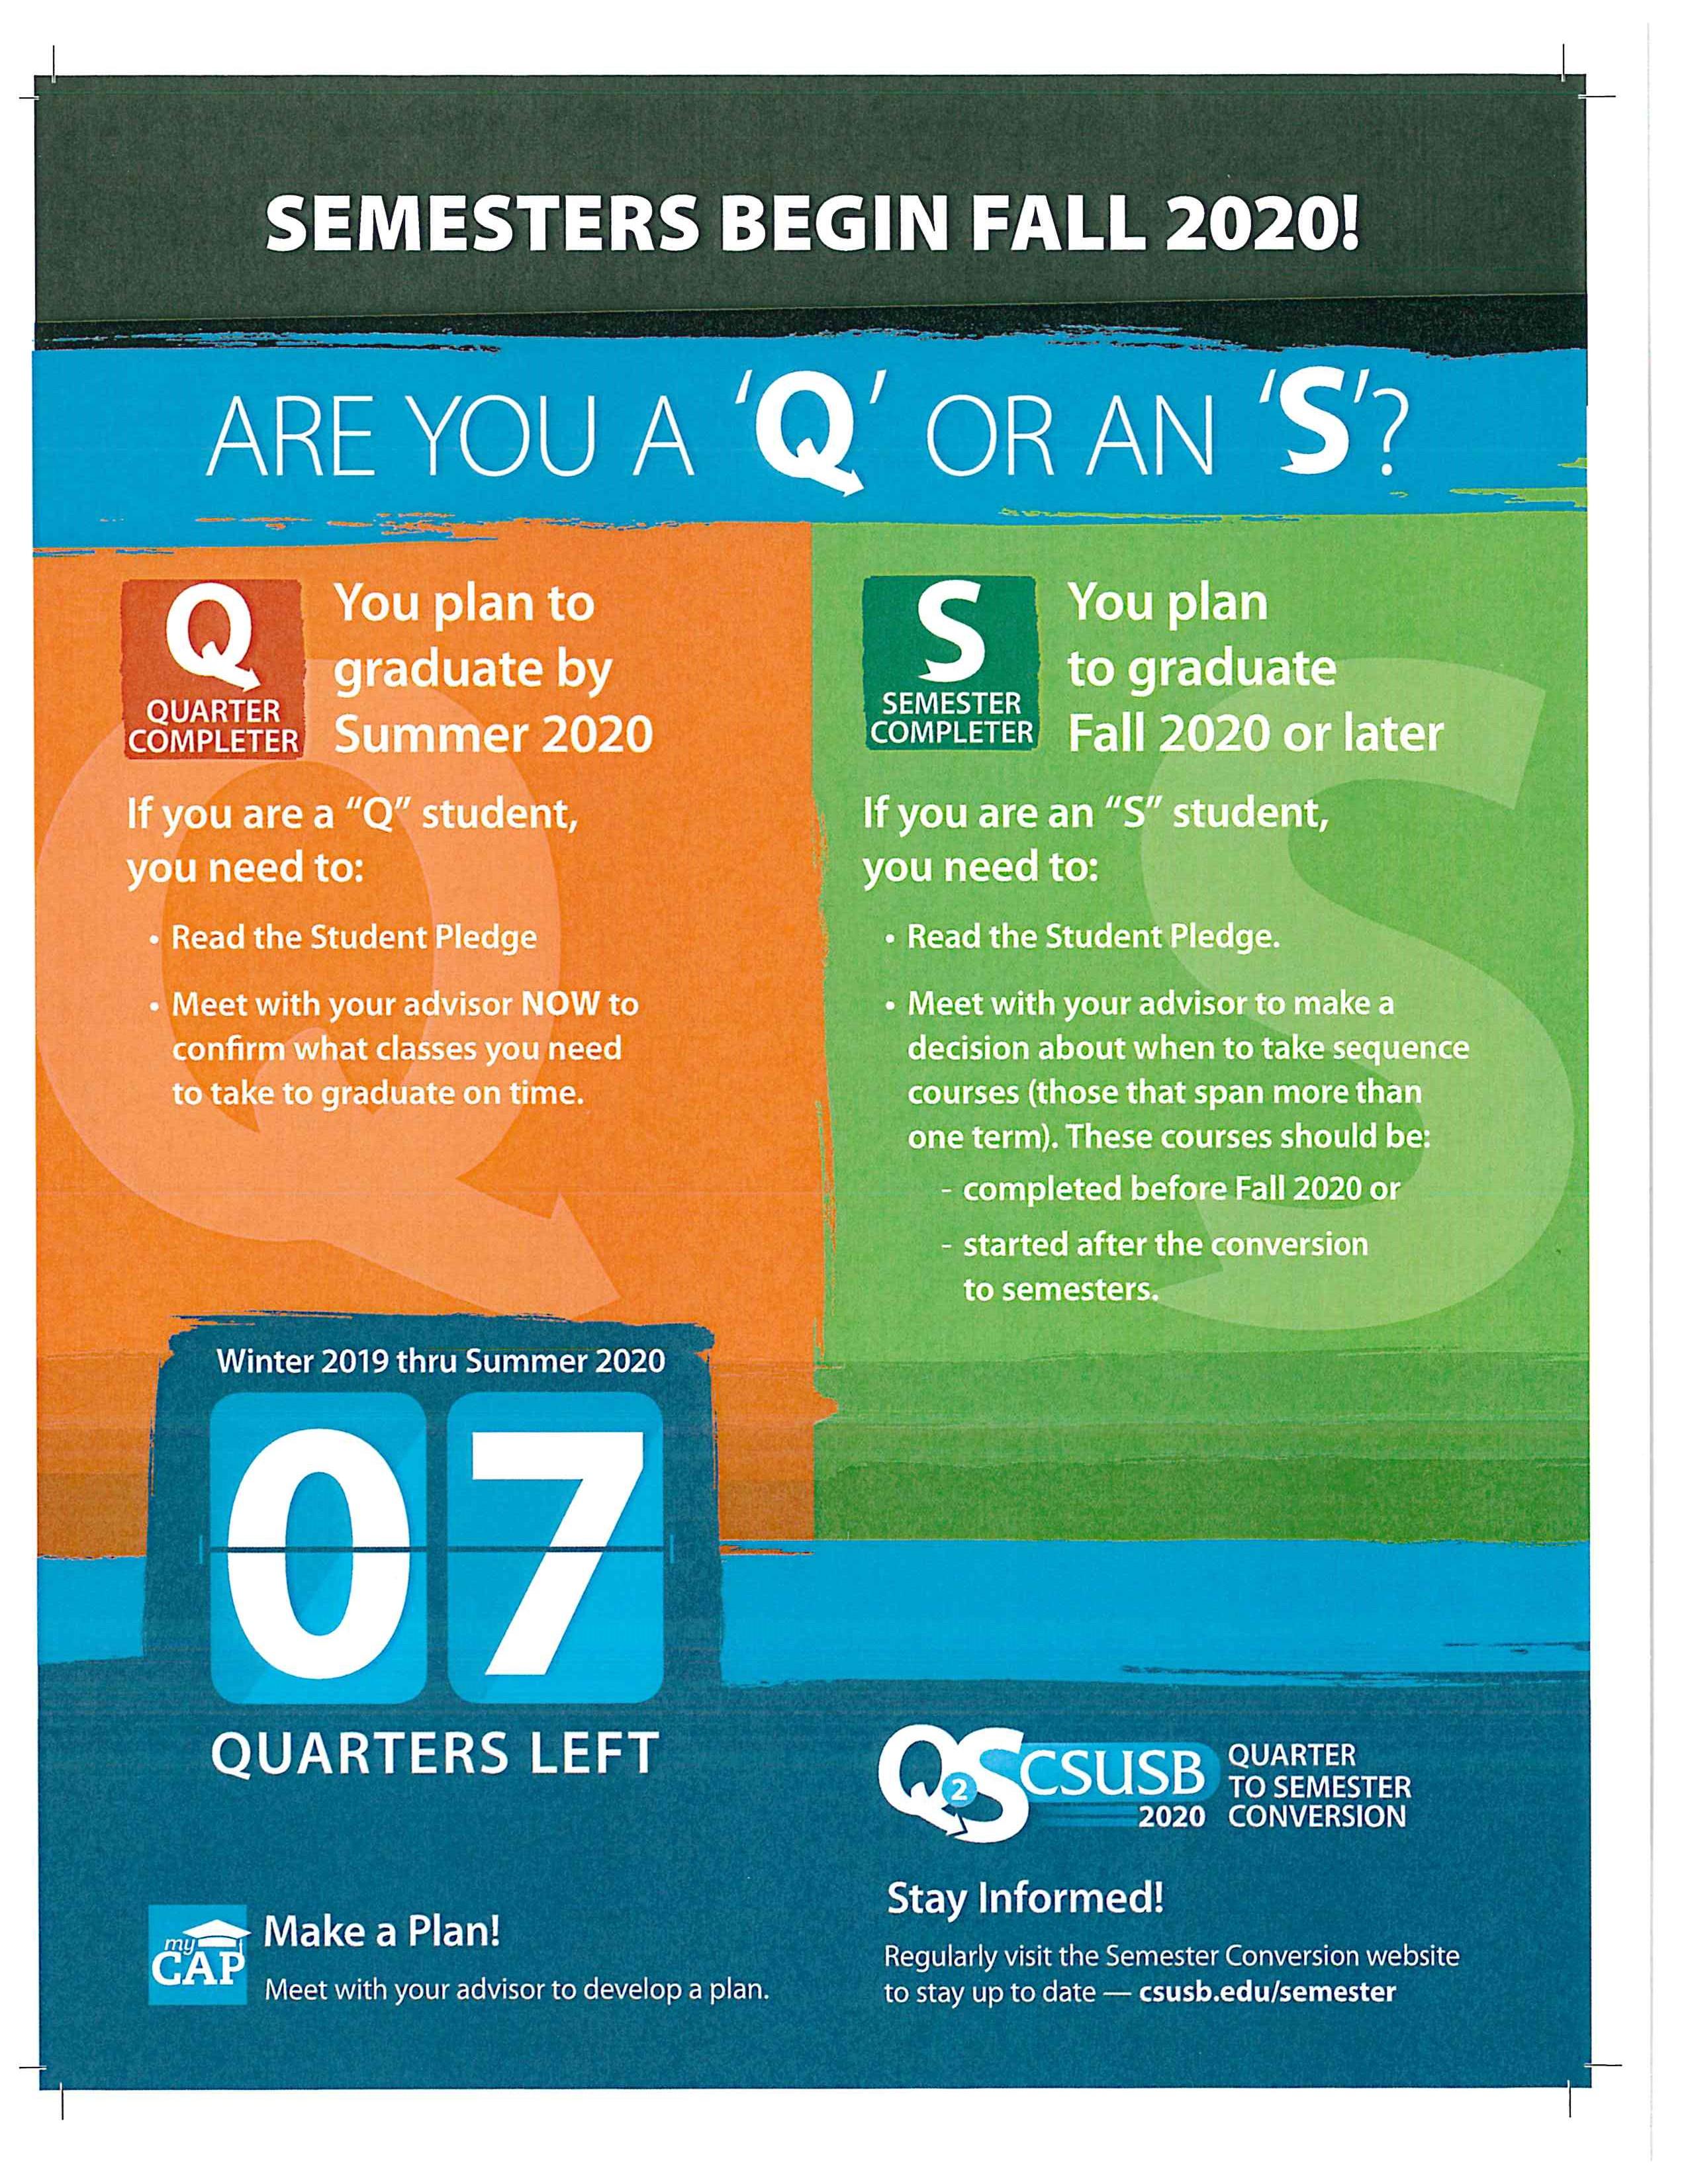 Q 2 S flyer